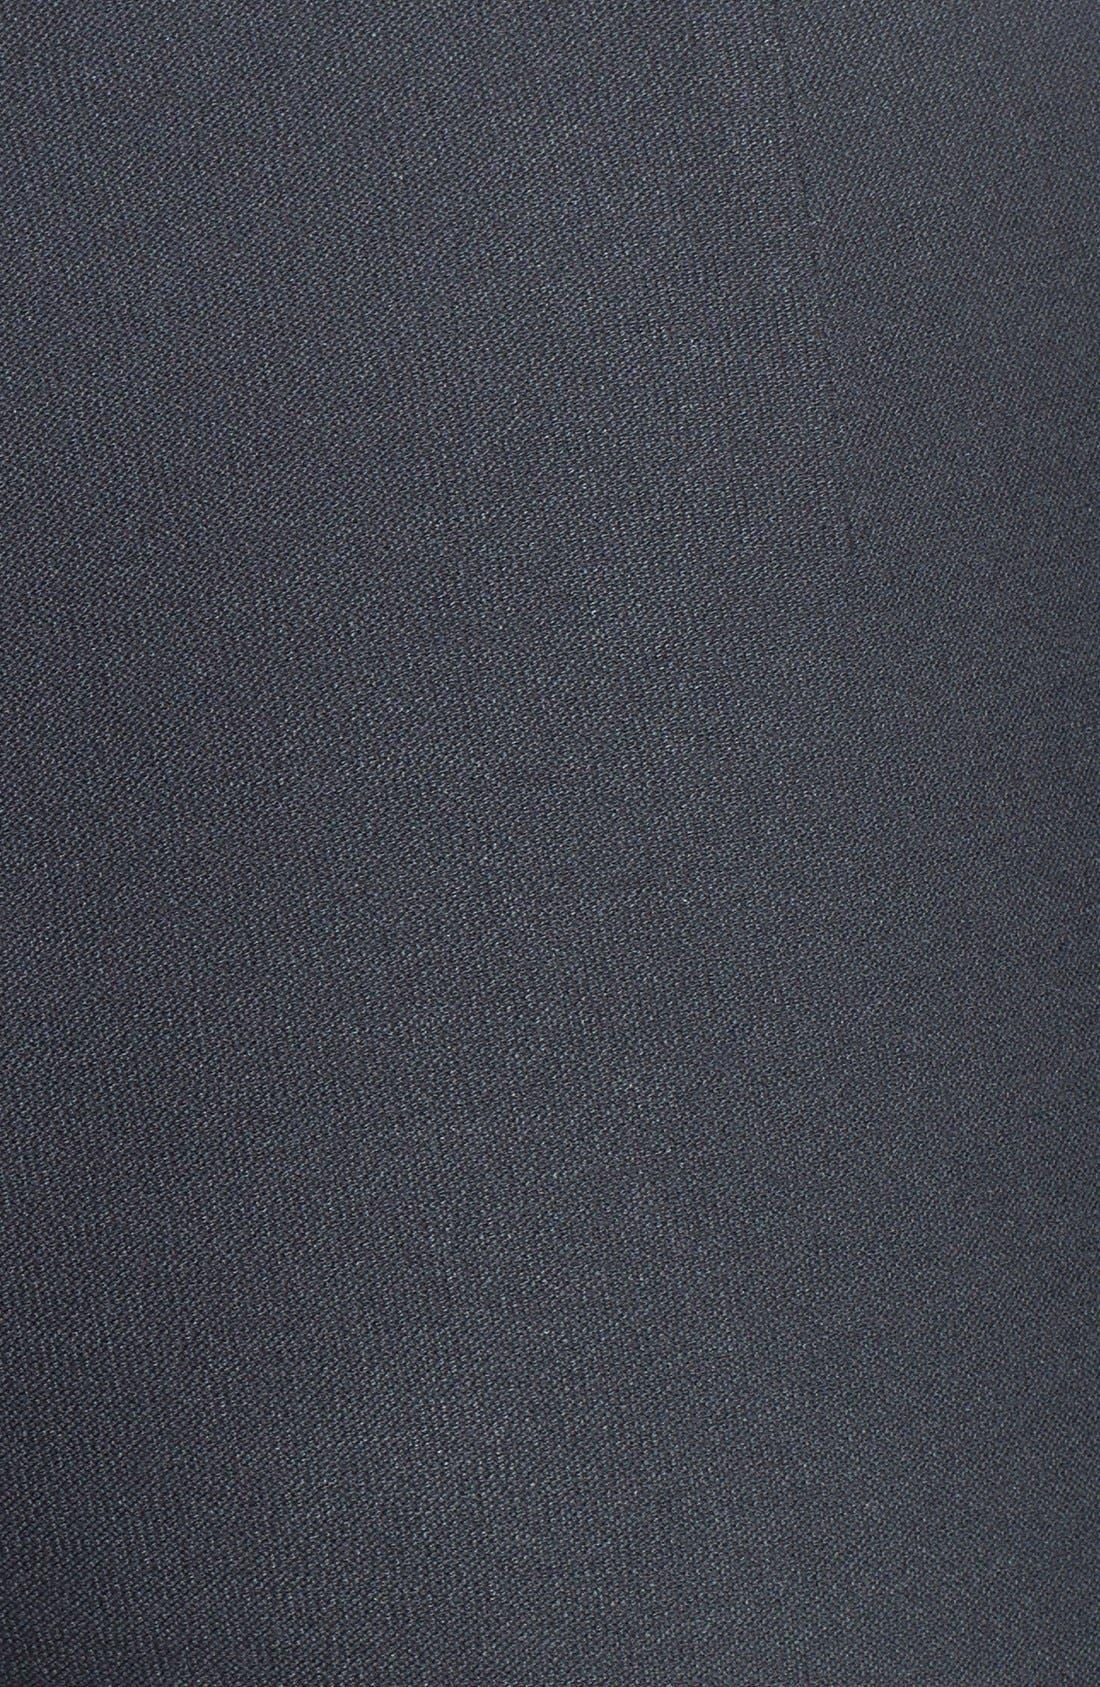 Alternate Image 3  - Eileen Fisher Slim Ankle Pants